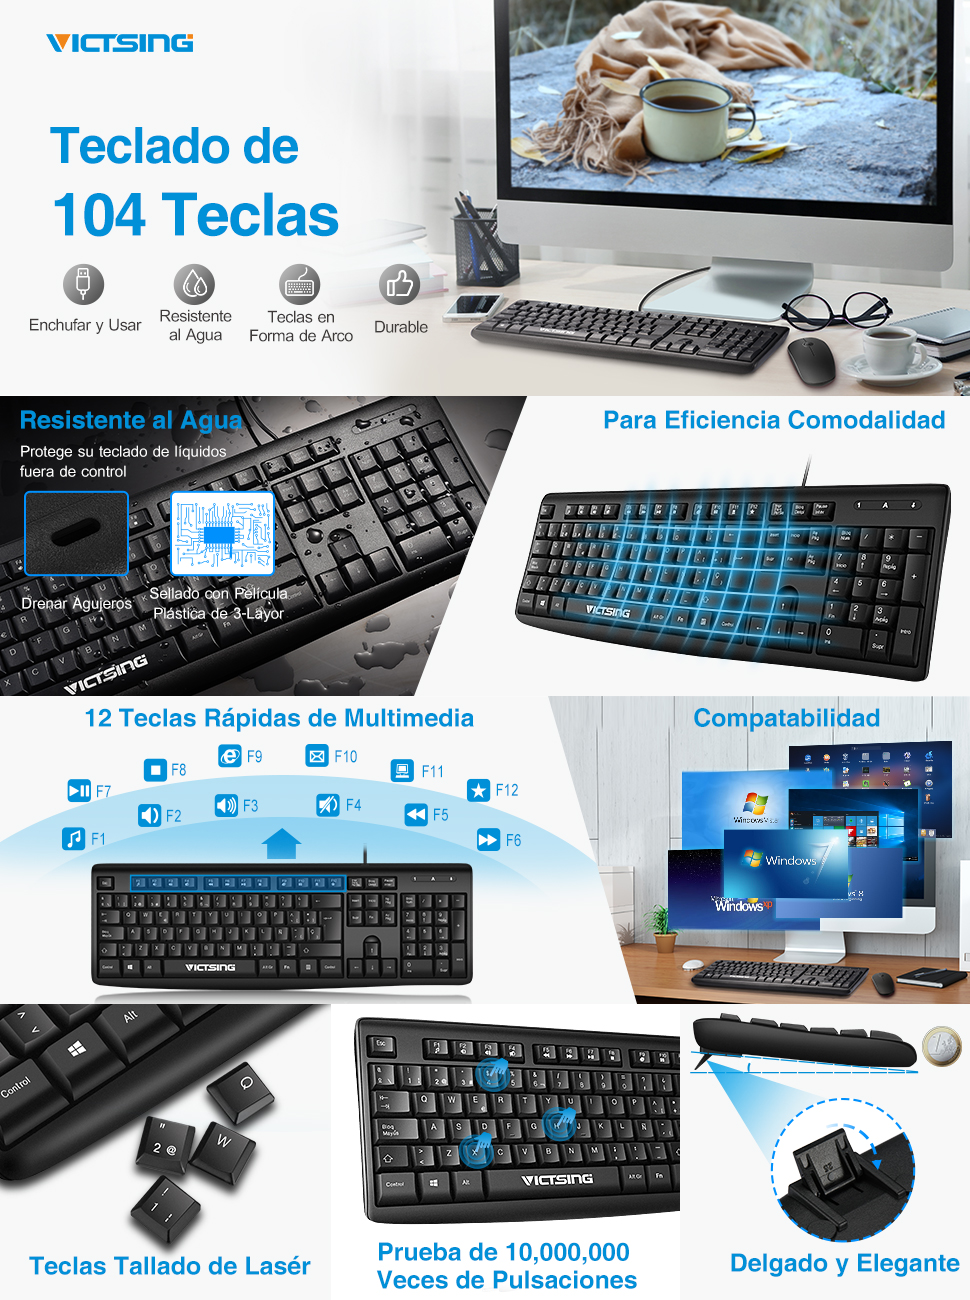 VicTsing Teclado USB Español, para PC o Mac, 104 Teclas, Compatible con Windows 10/8/7/Vista/XP, Linux, QWERTY - Negro